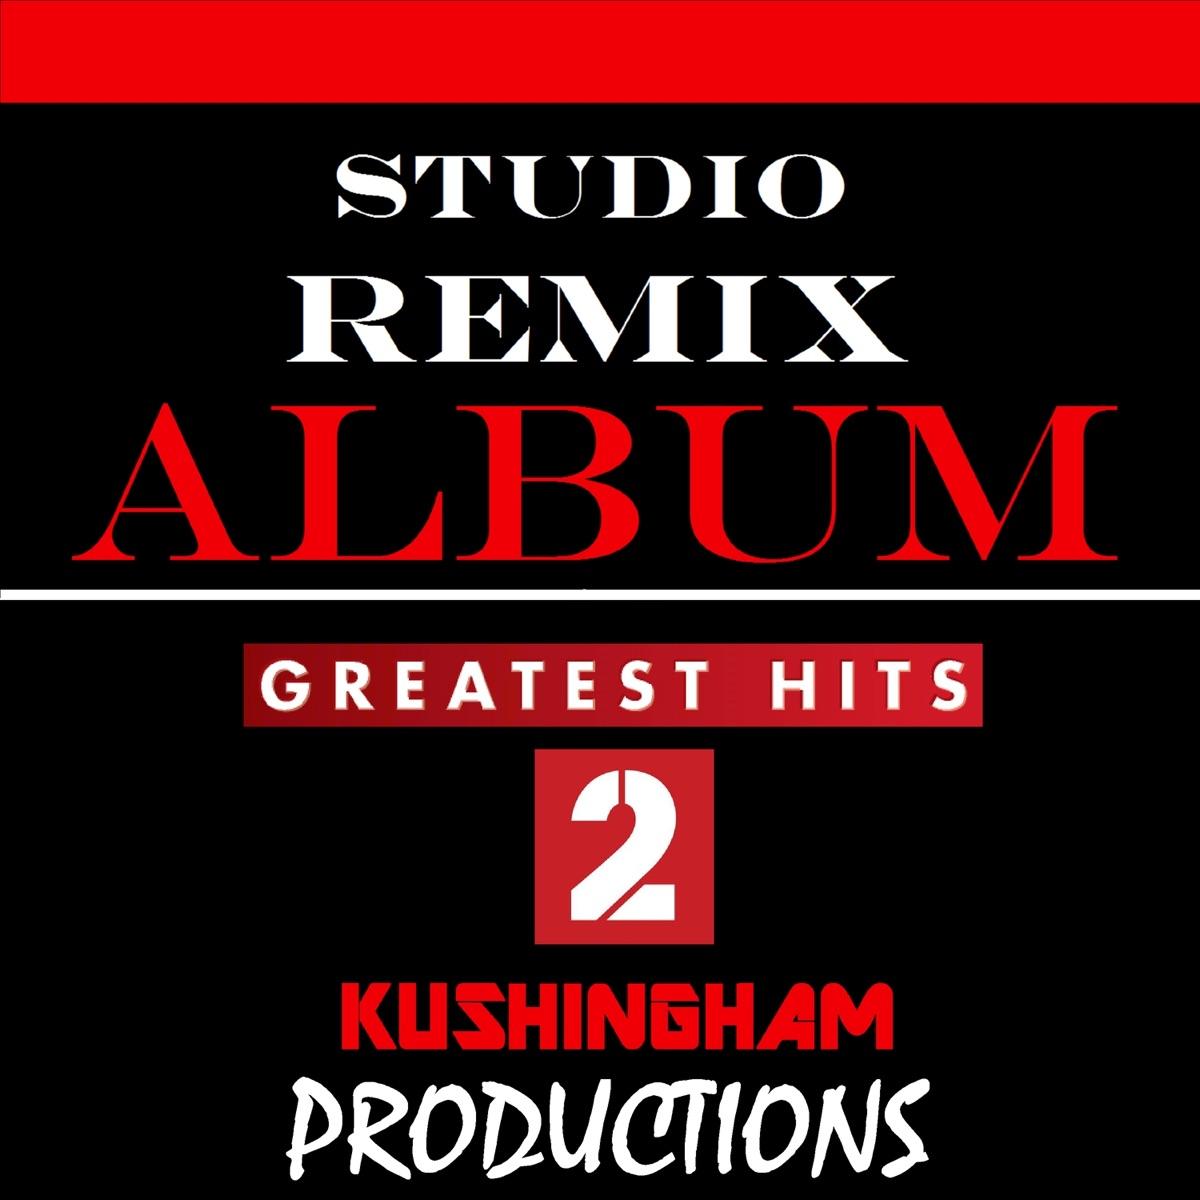 Studio Remix Album Greatest Hits Vol 2 Kushingham Productions CD cover